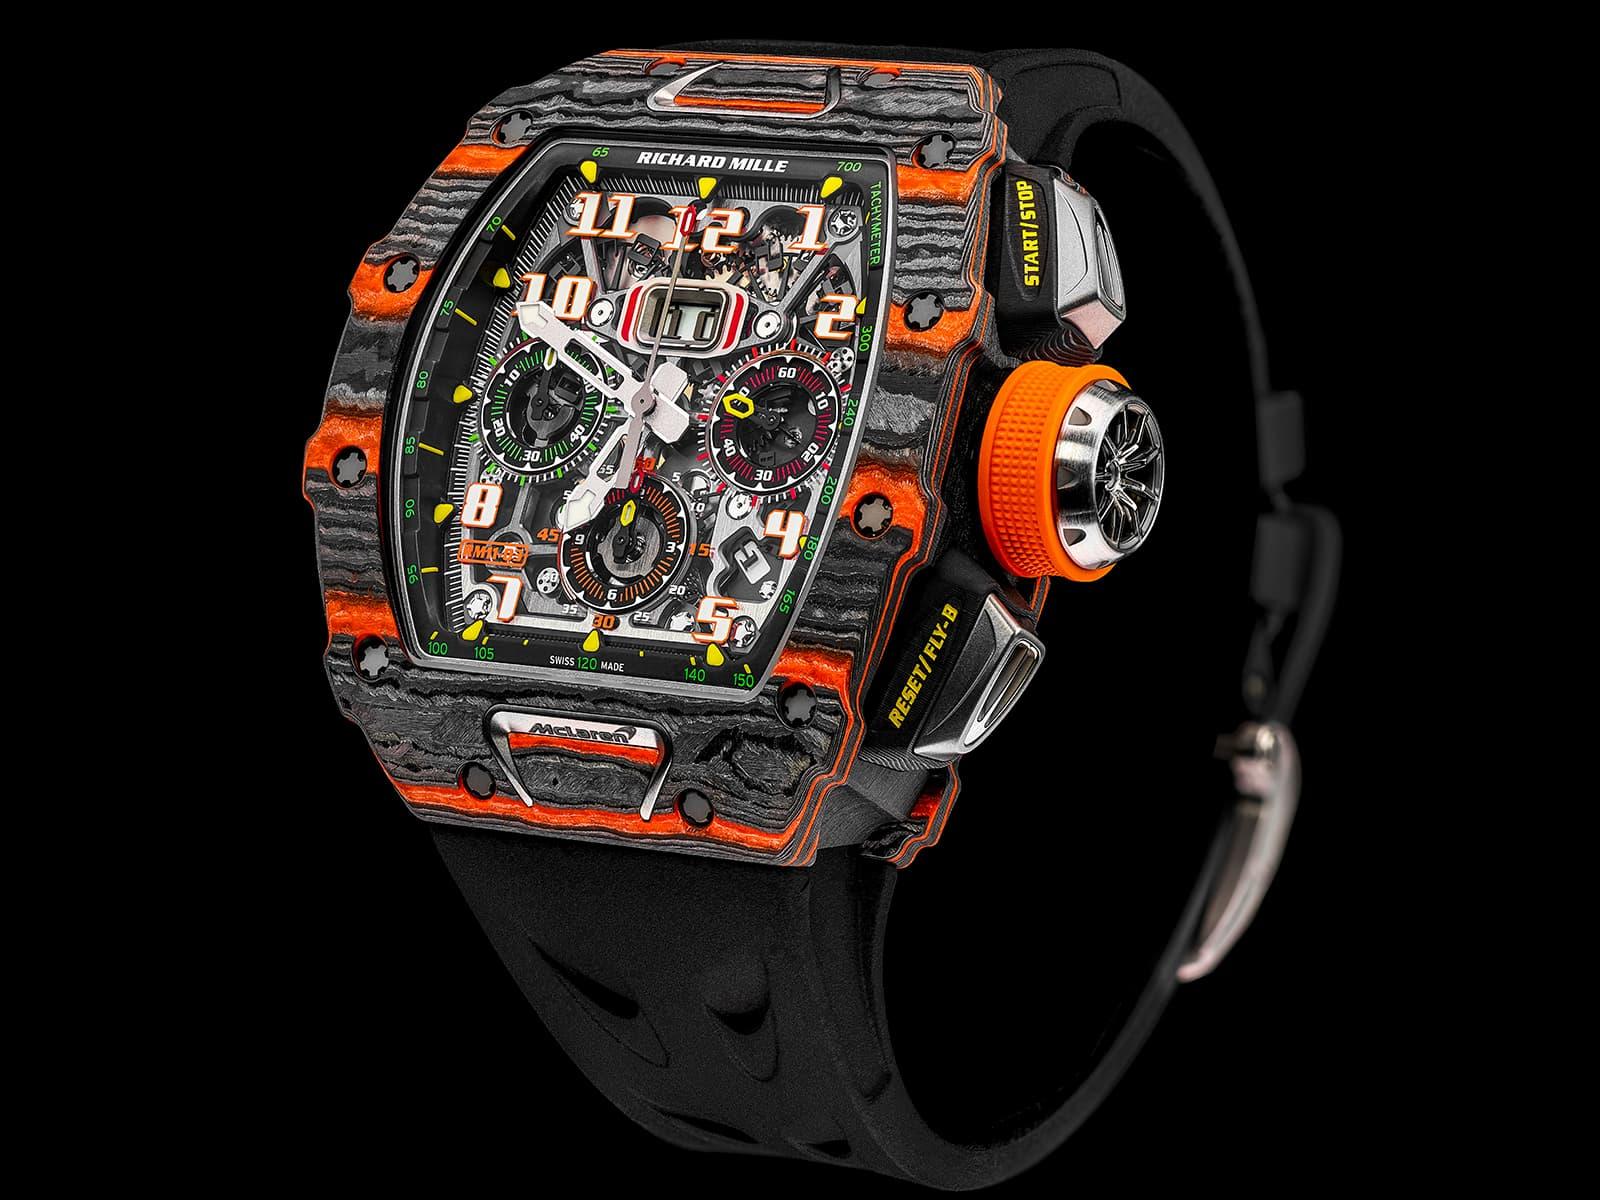 richard-mille-rm-11-03-mcLaren-automatic-flyback-chronograph.jpg